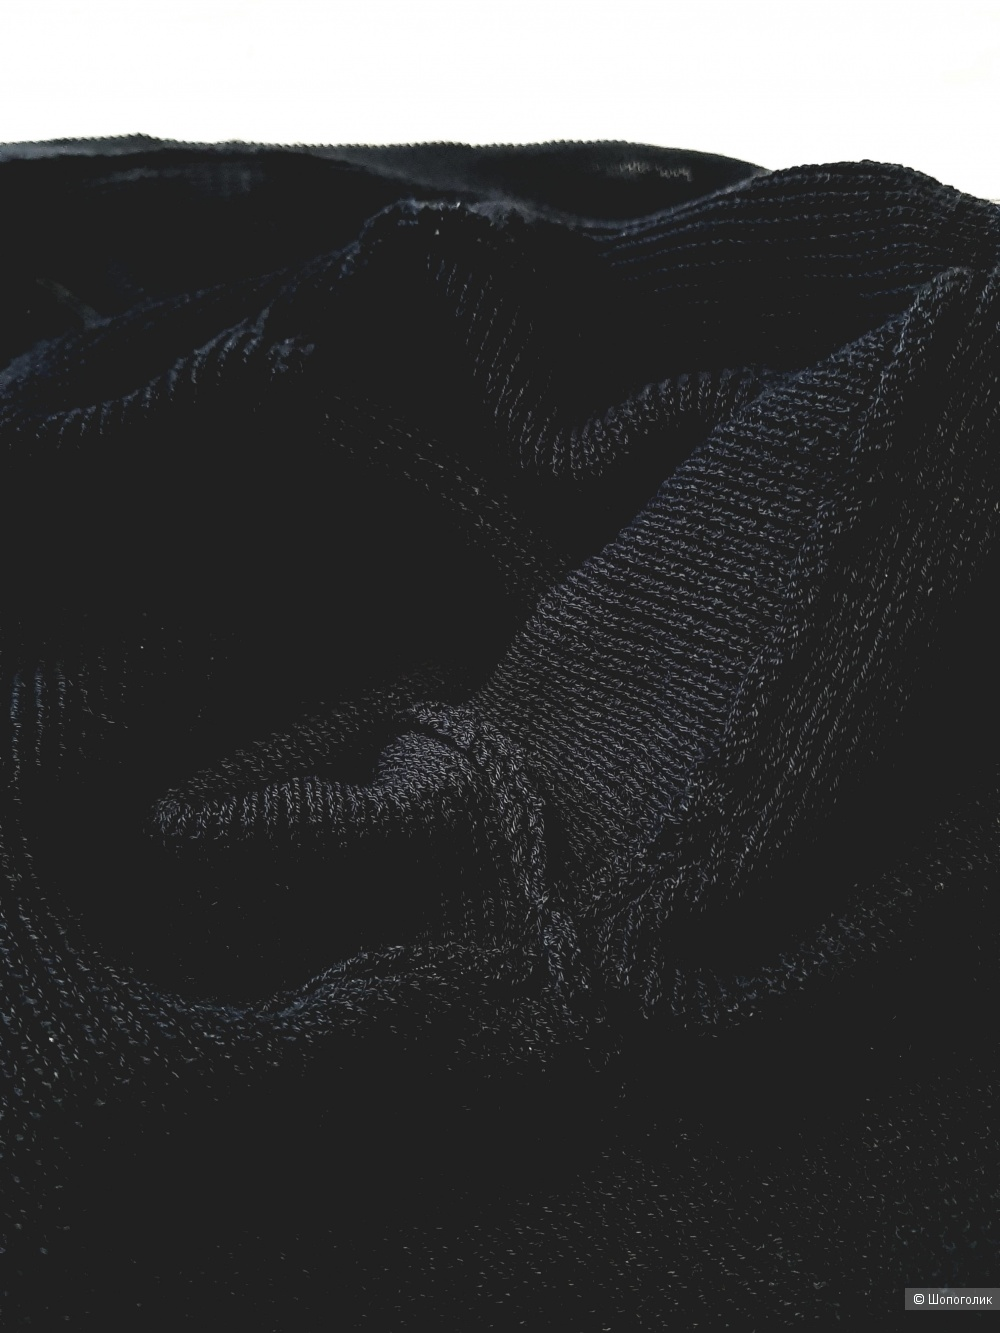 Кардиган MAURO GRIFONI, размер XL/L